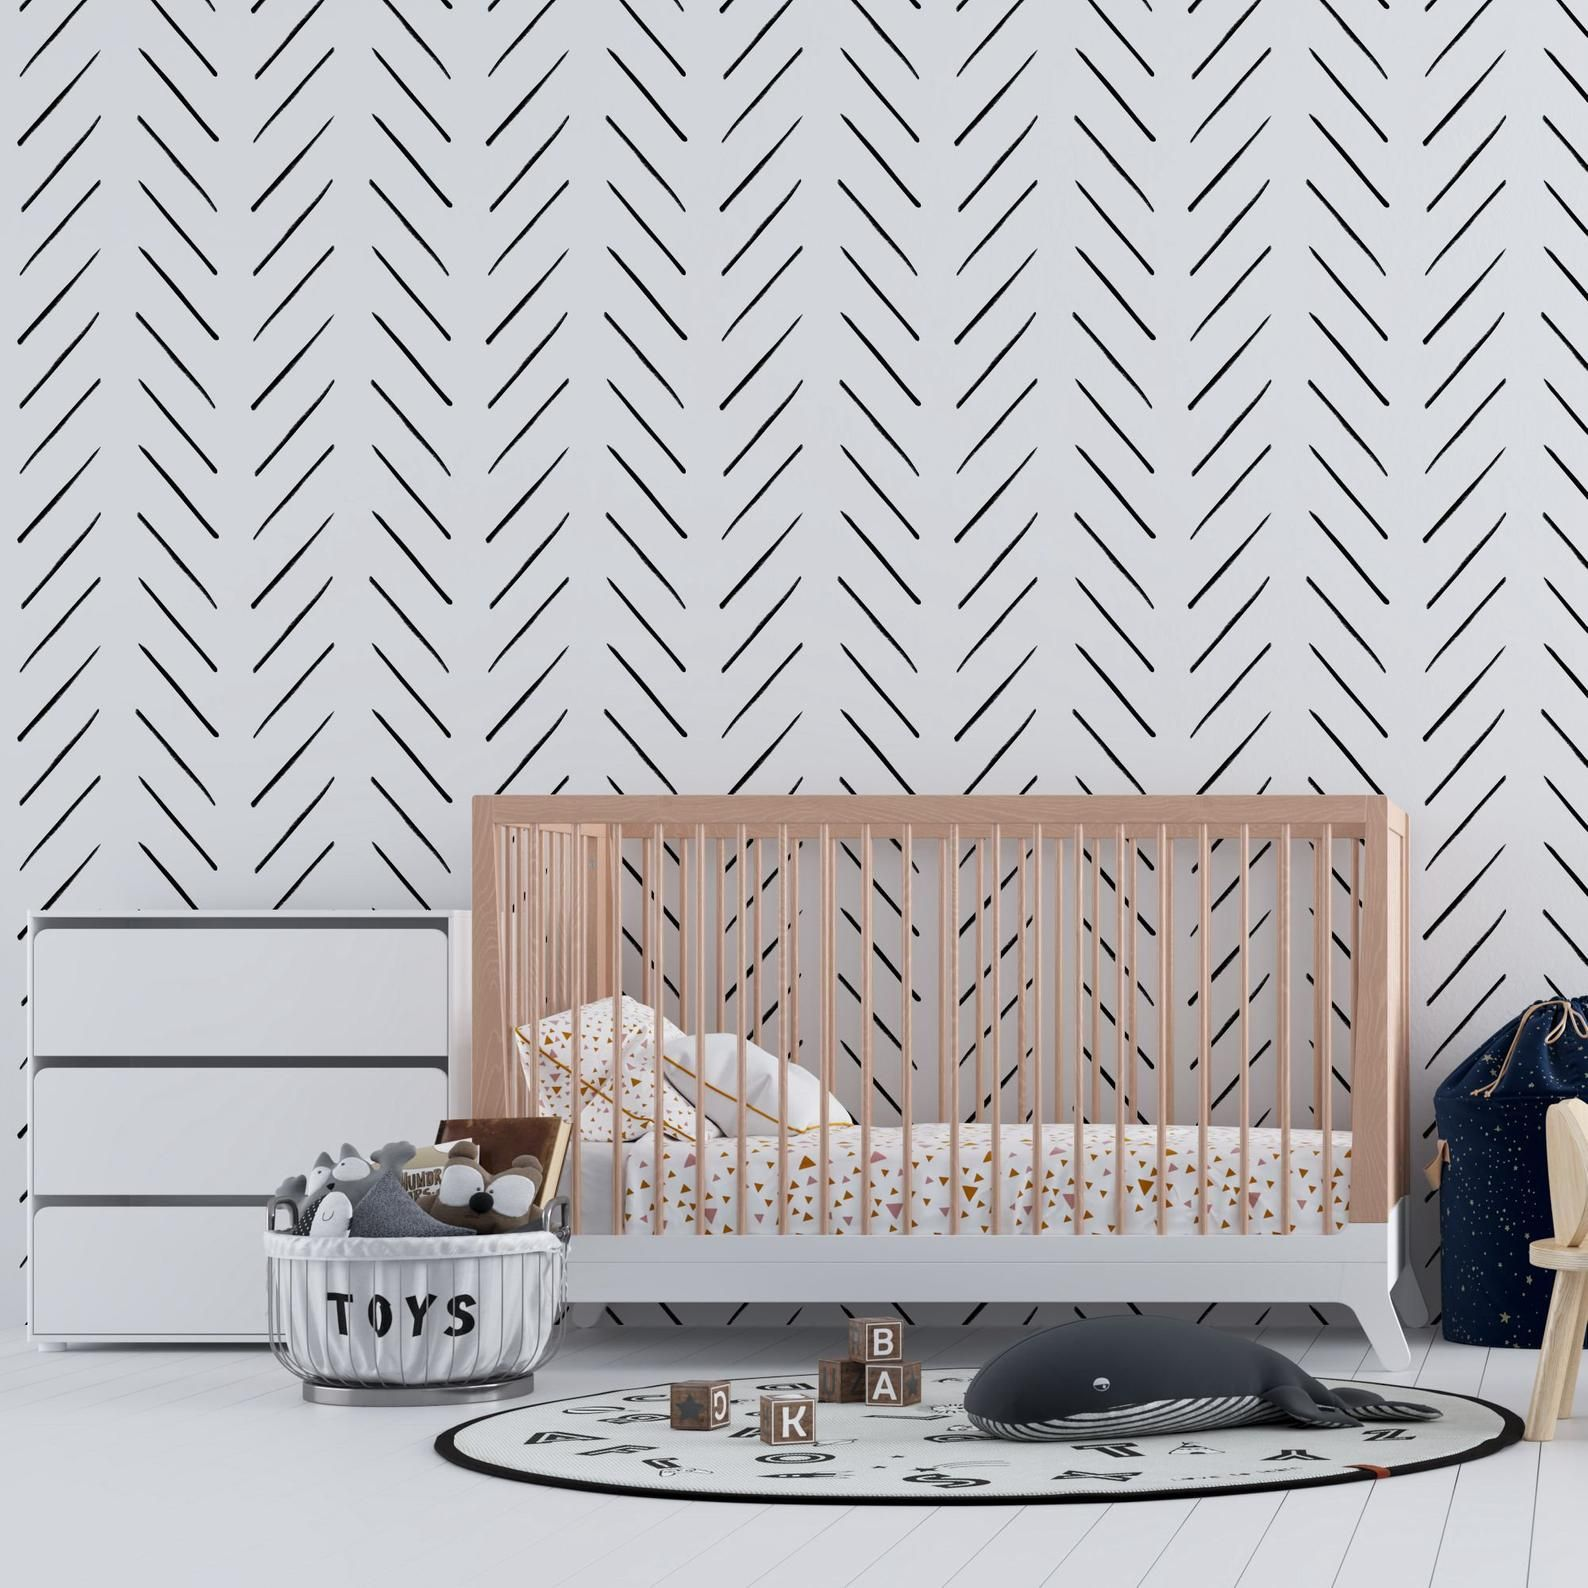 Escamilla Herringbone 18 86 L X 18 W Peel And Stick Wallpaper Roll Peel And Stick Wallpaper Room Visualizer Wallpaper Roll